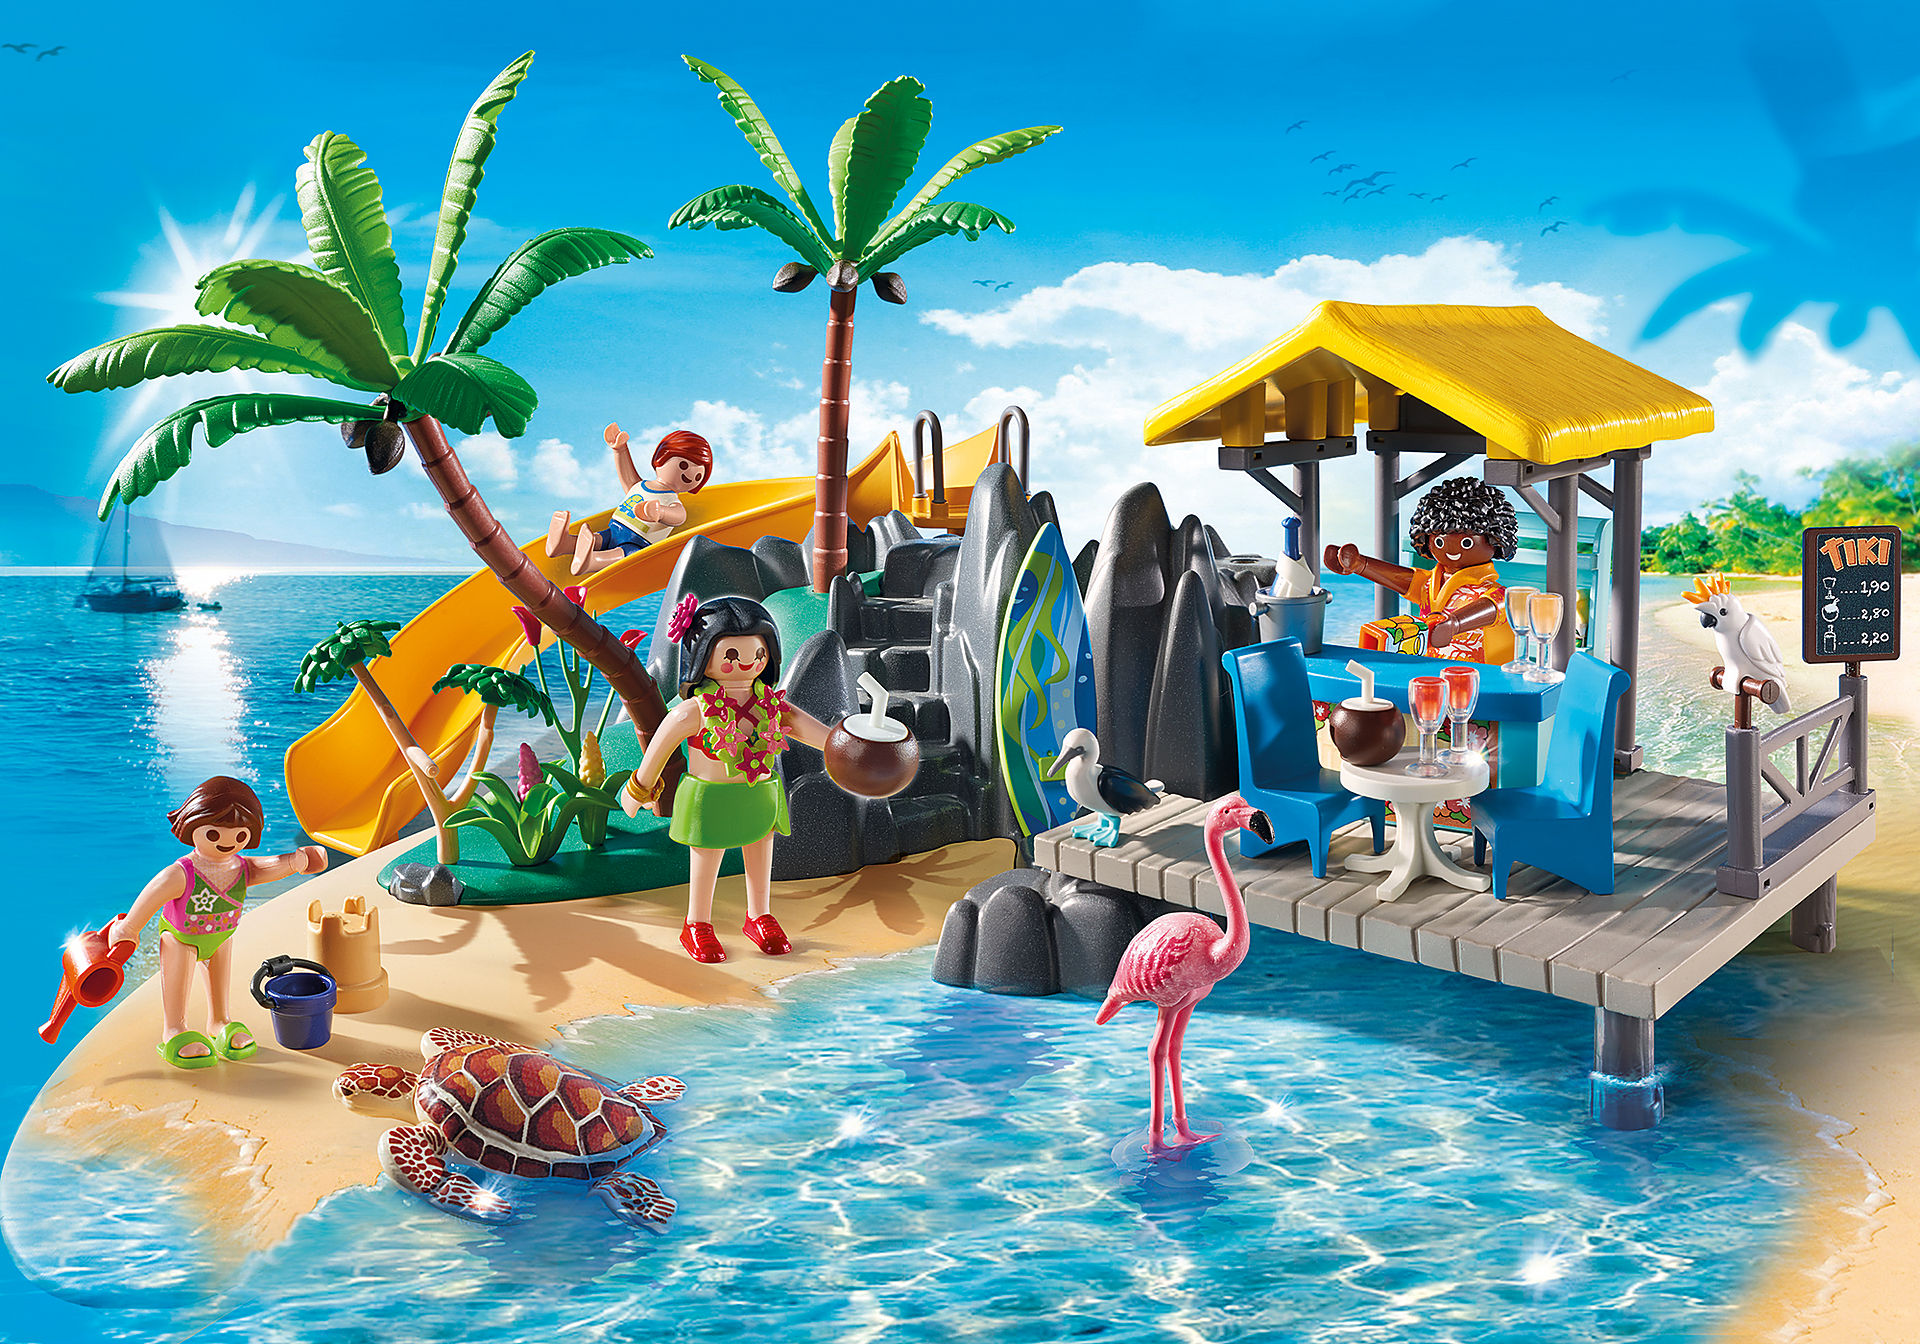 http://media.playmobil.com/i/playmobil/6979_product_detail/Island Juice Bar